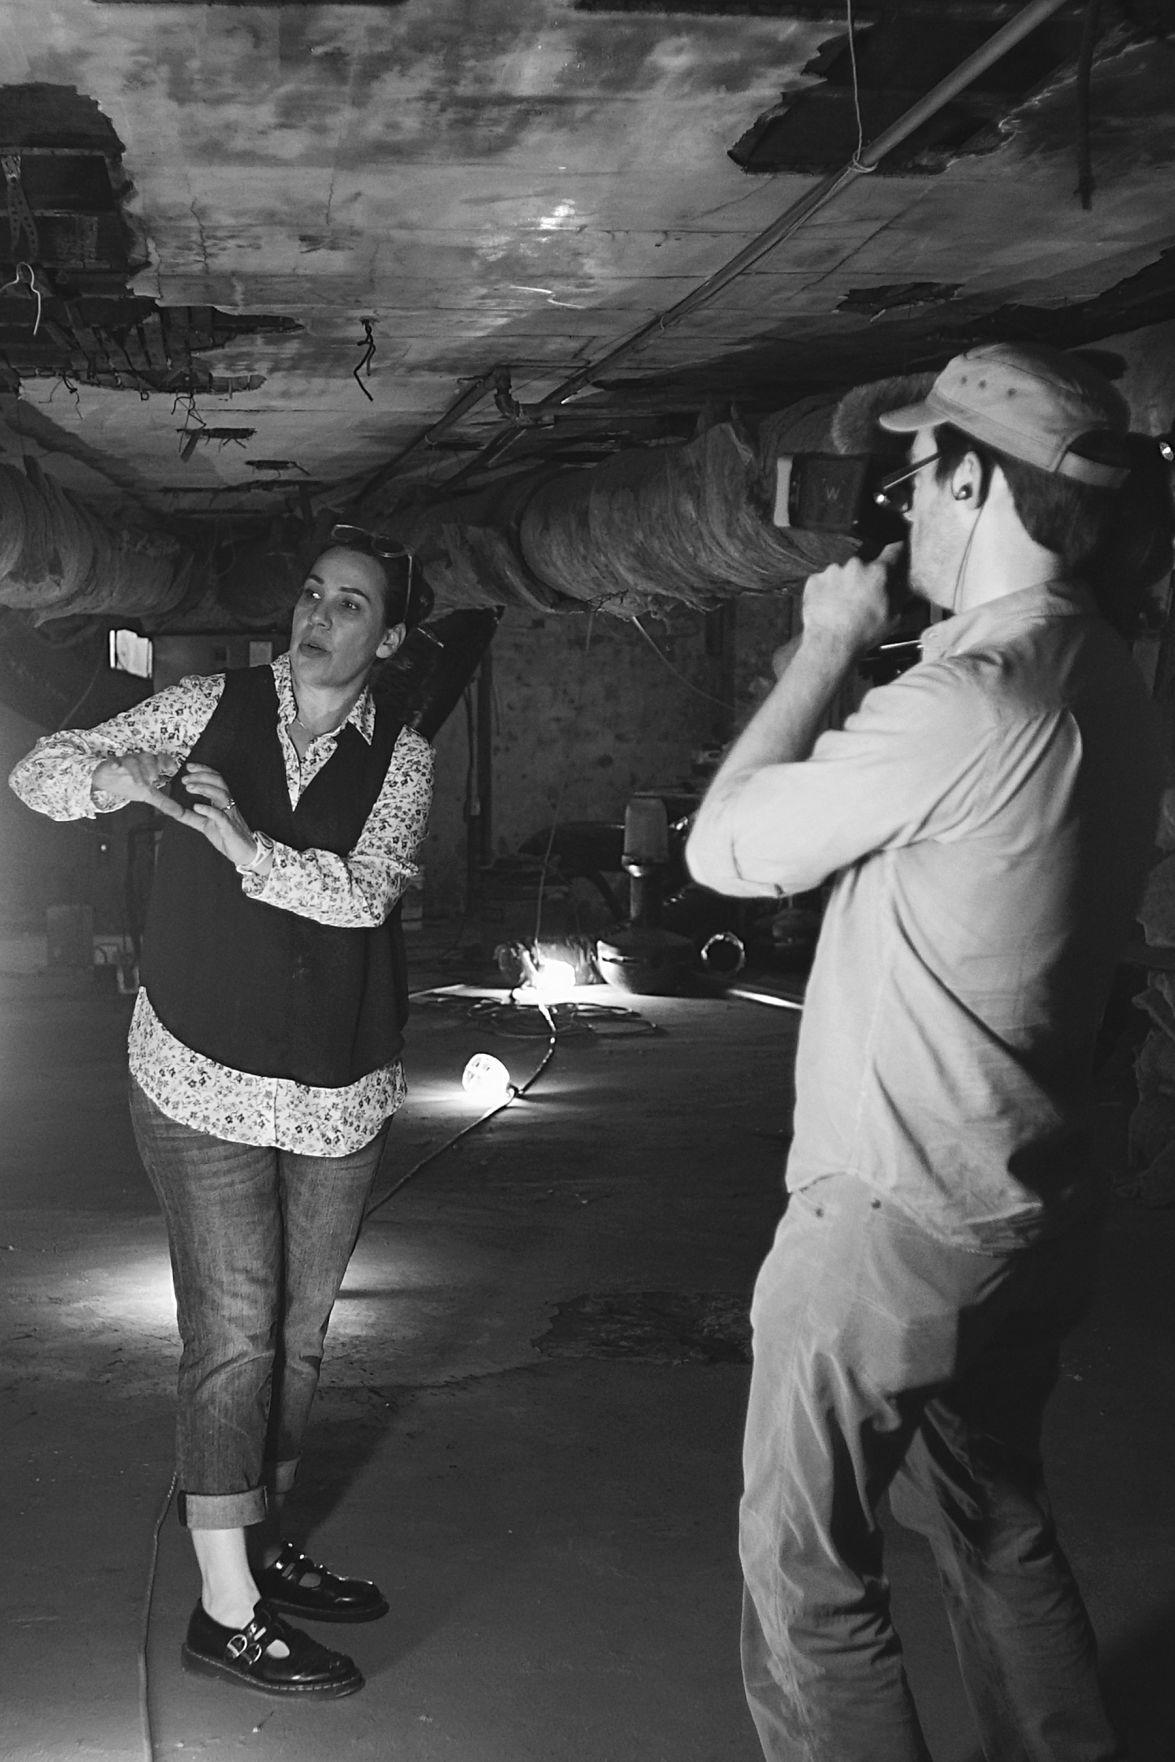 Filmmakers: Kjirsten Harpain